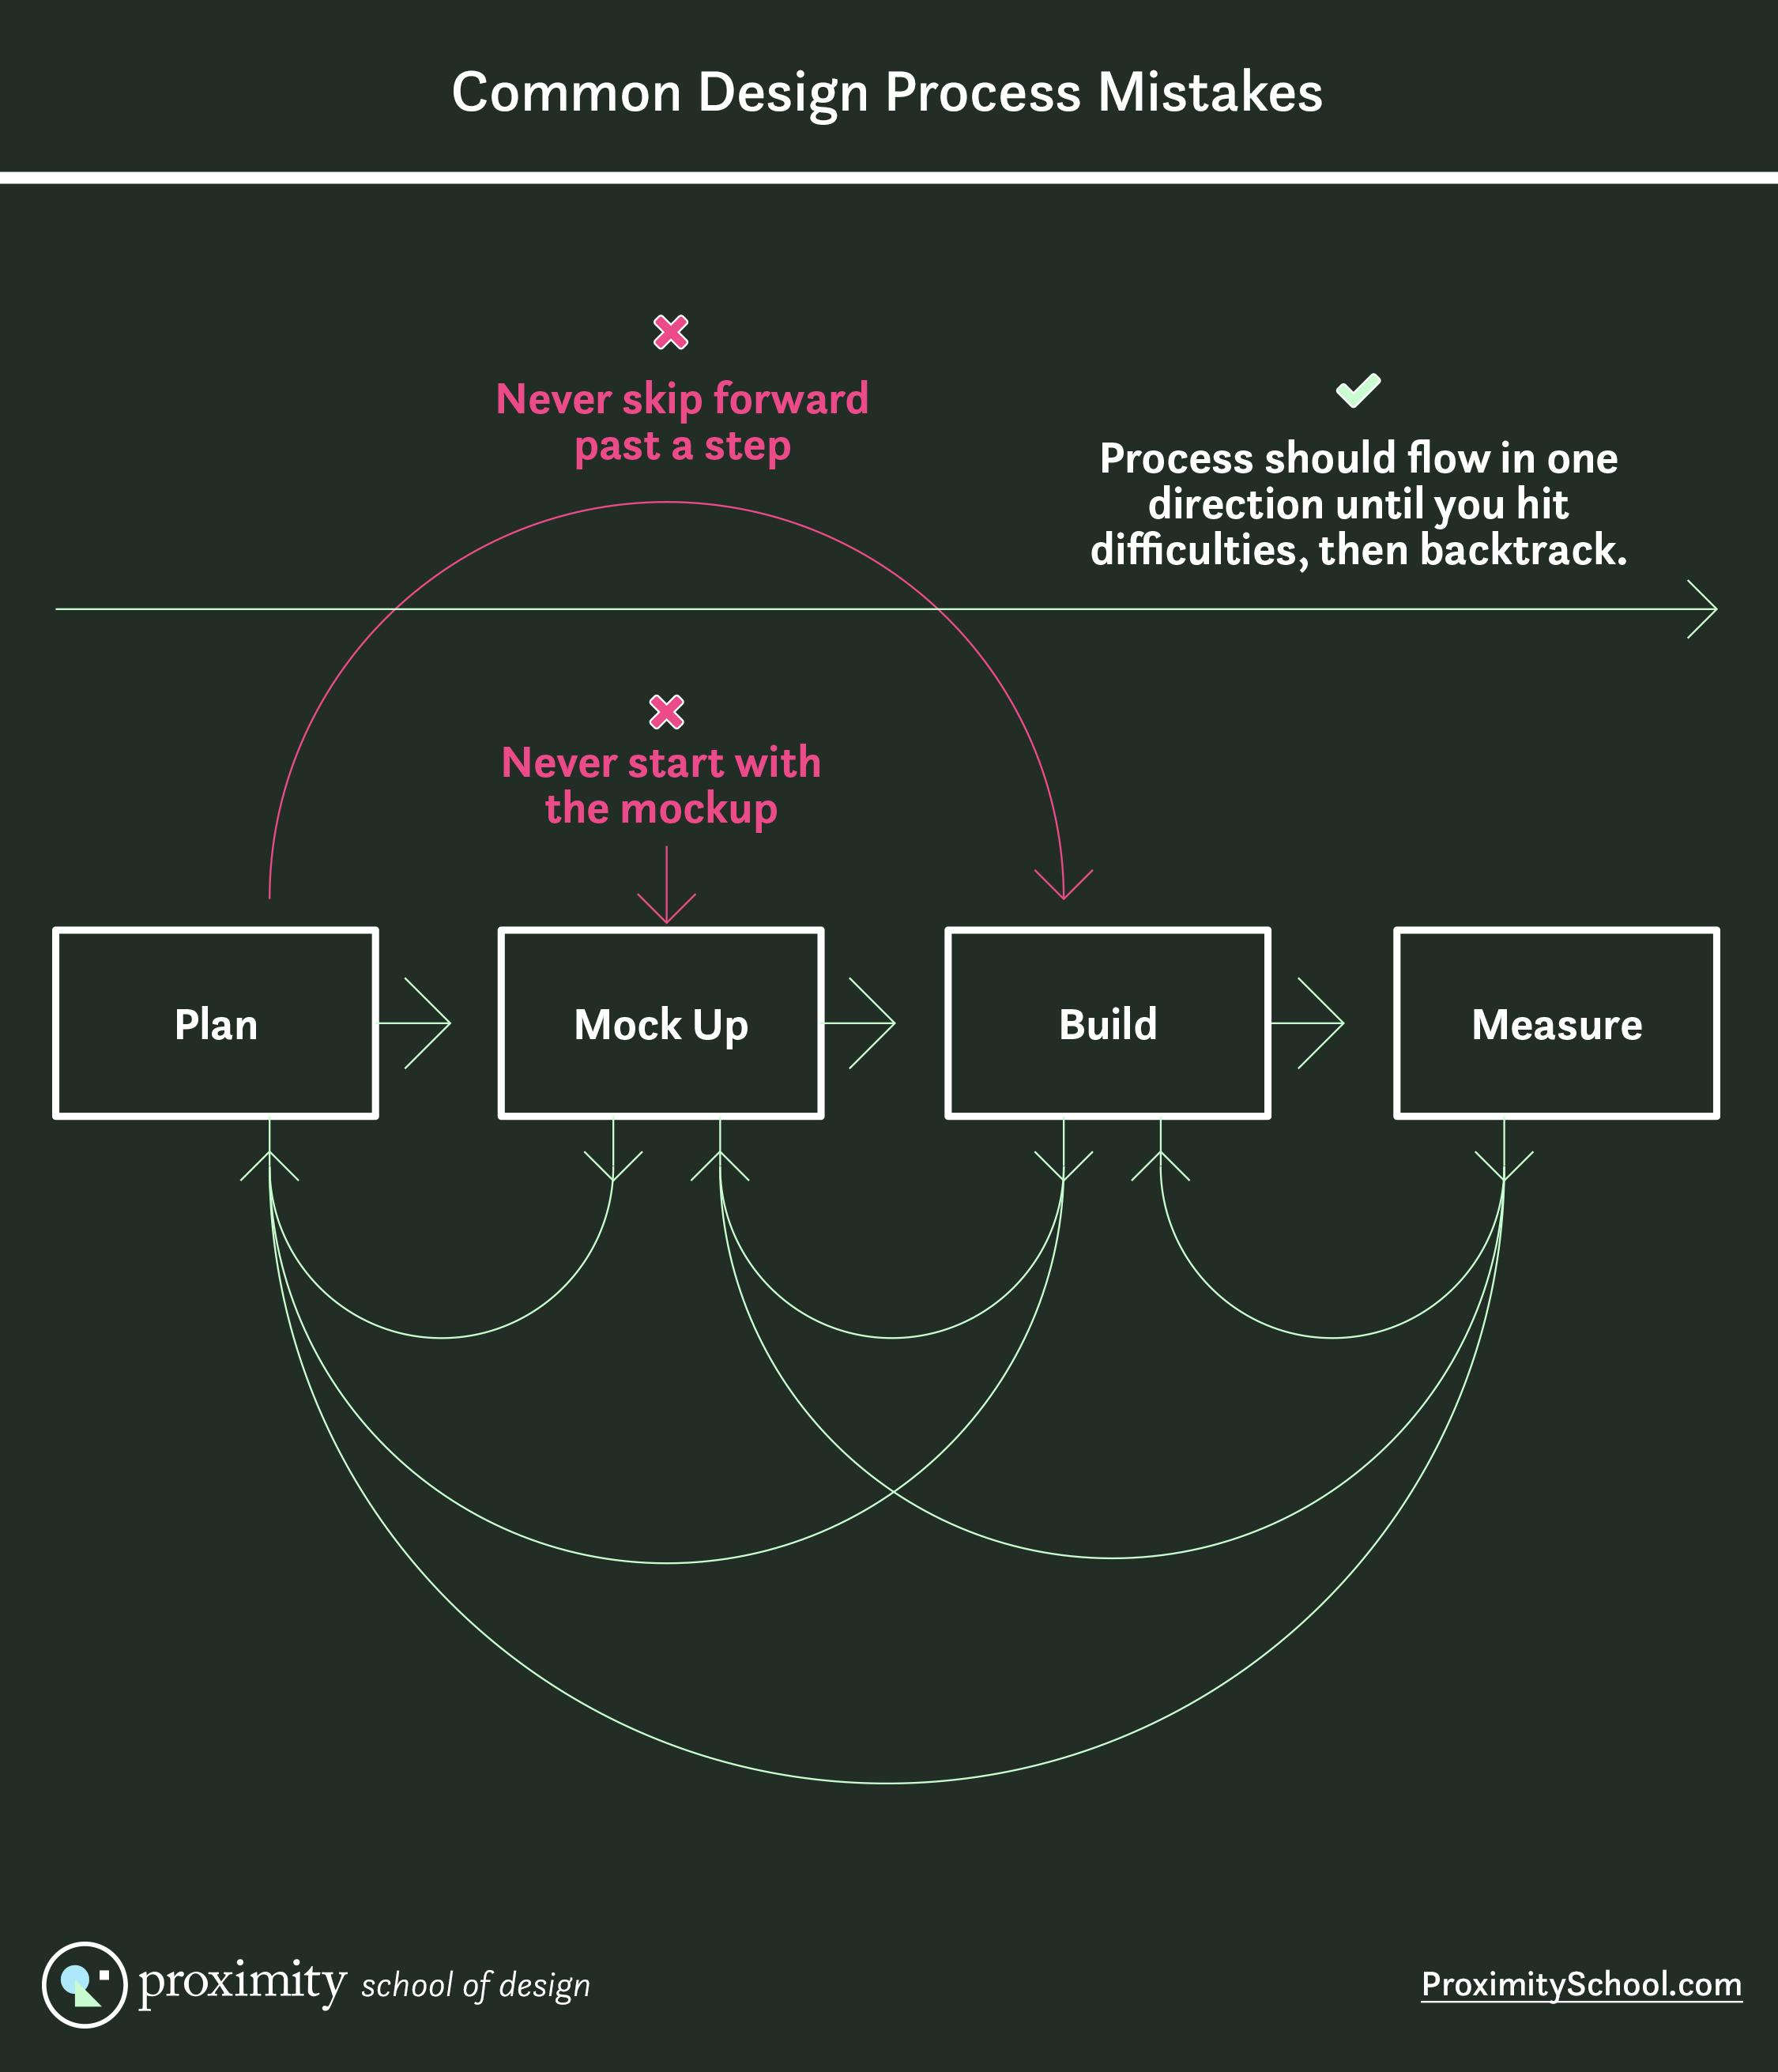 design process mistakes diagram